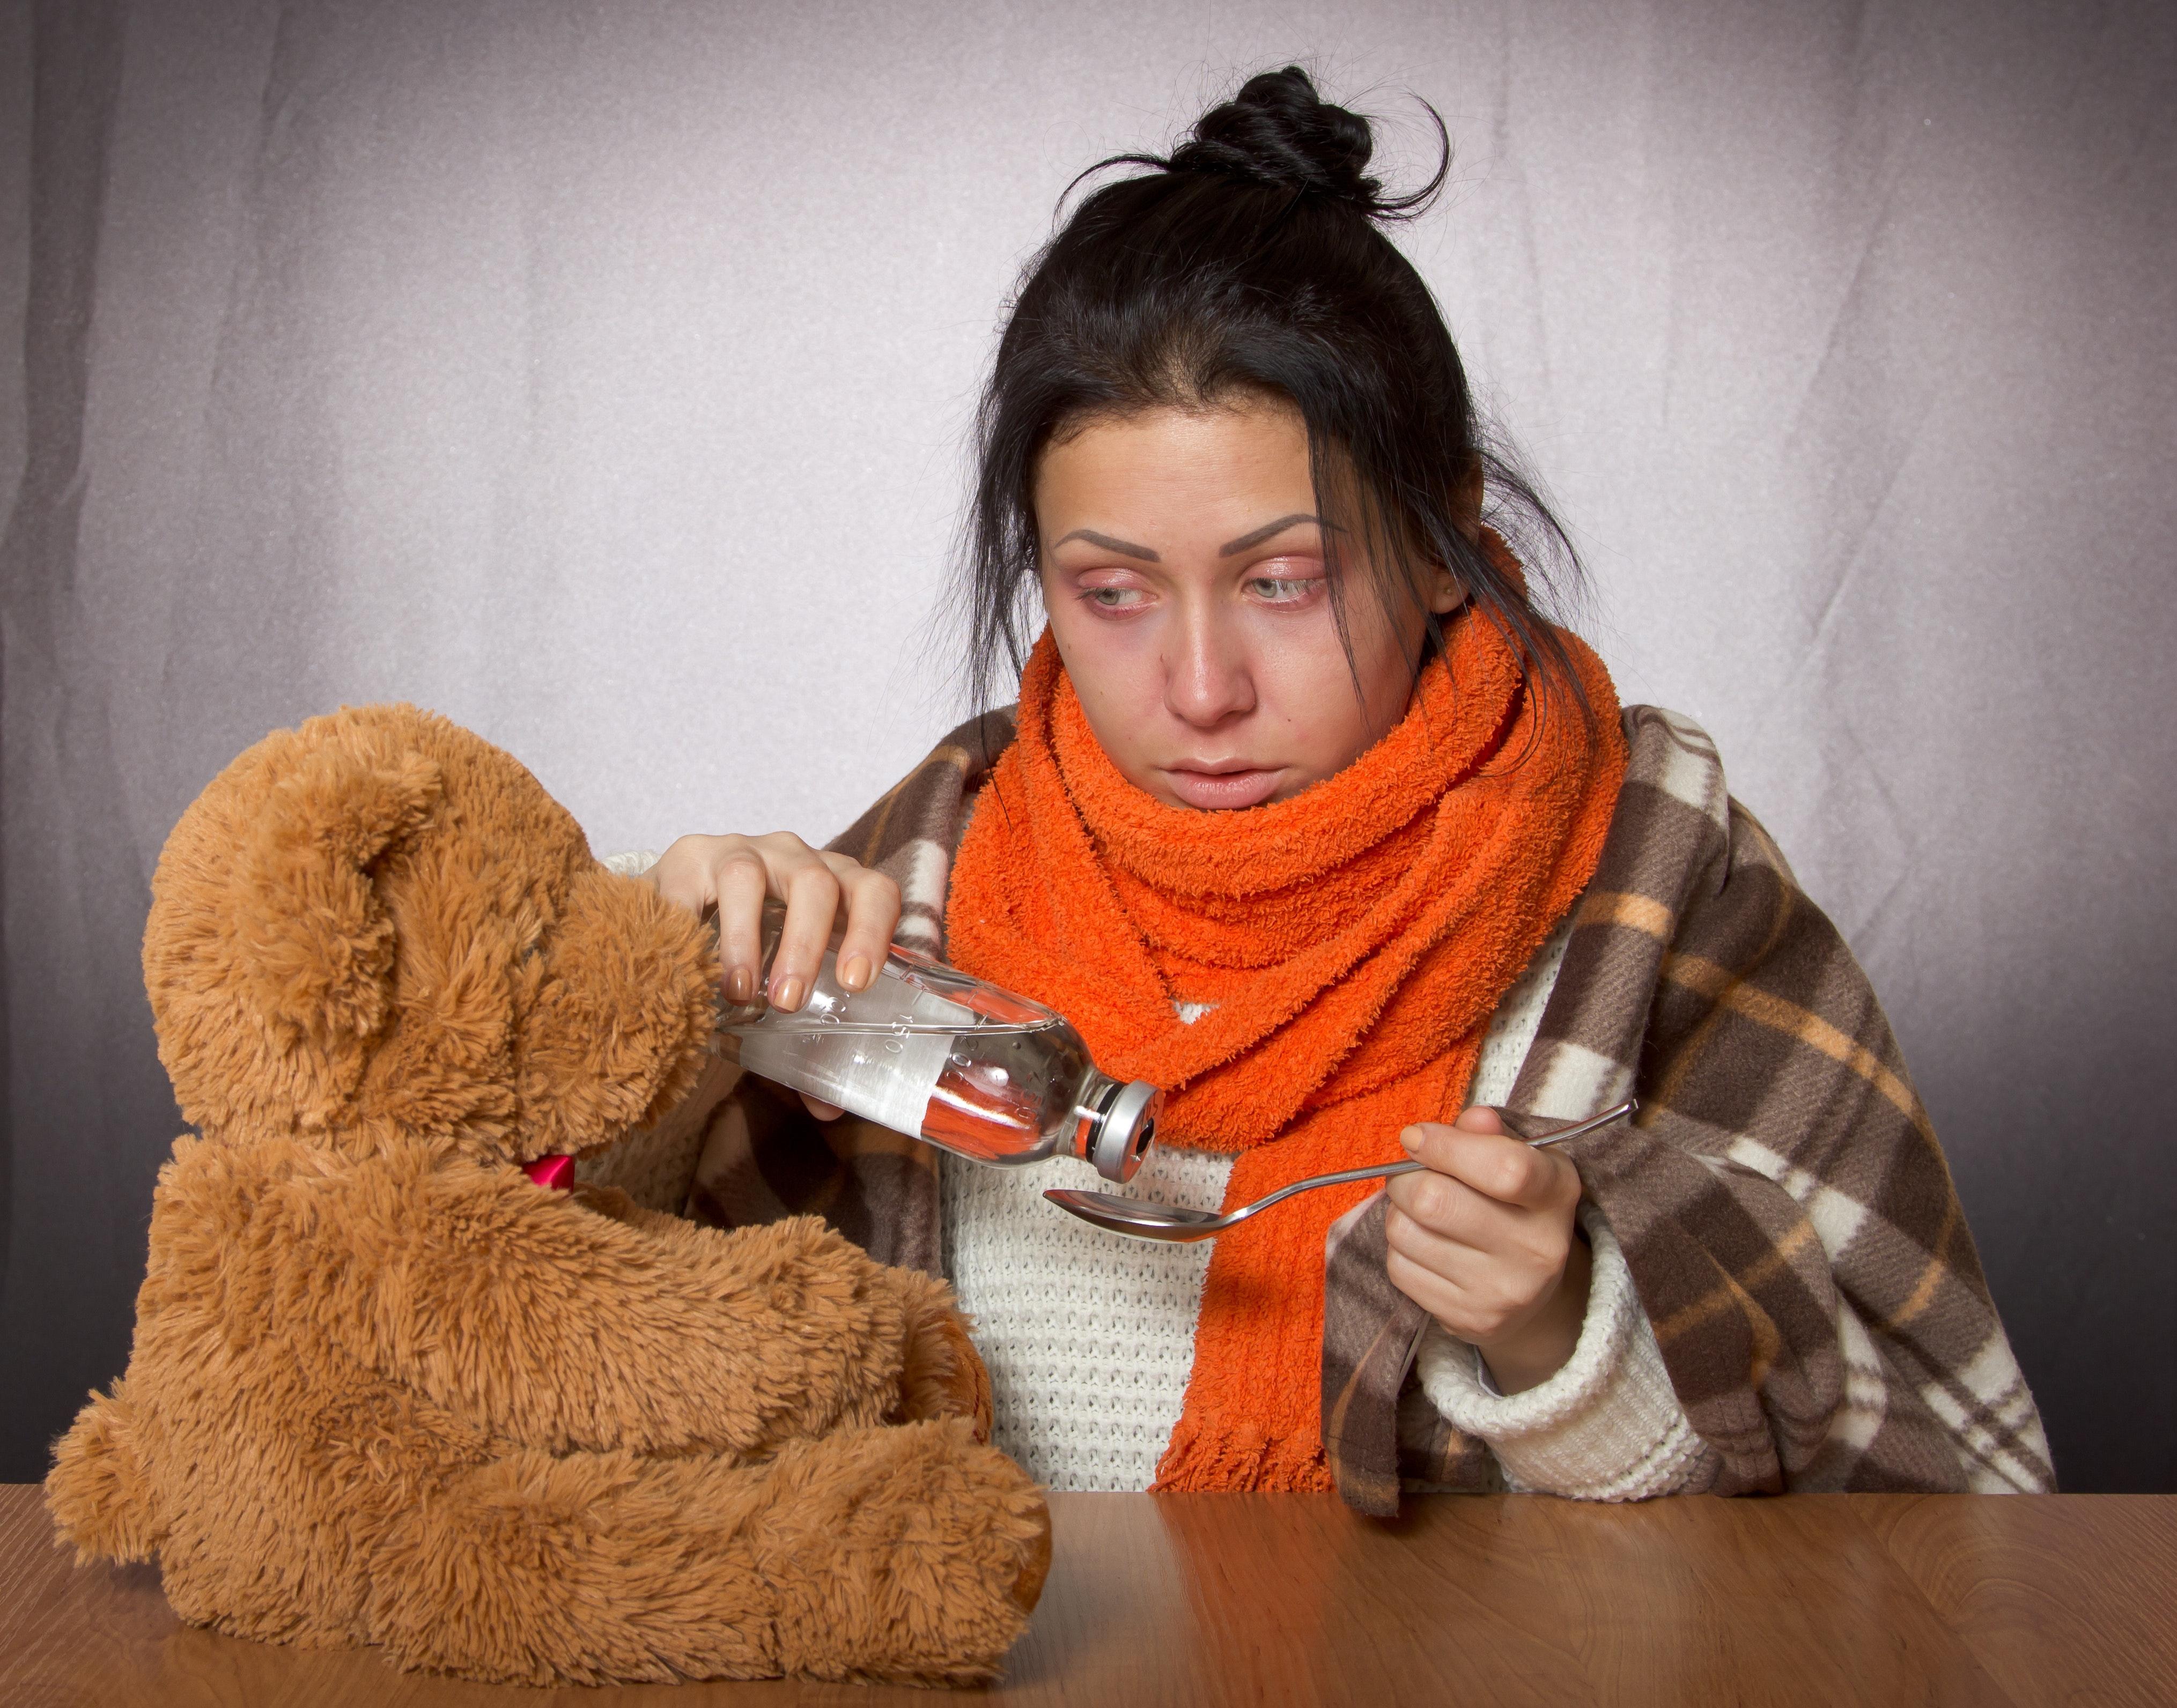 flu-girl-medication-372440.jpg